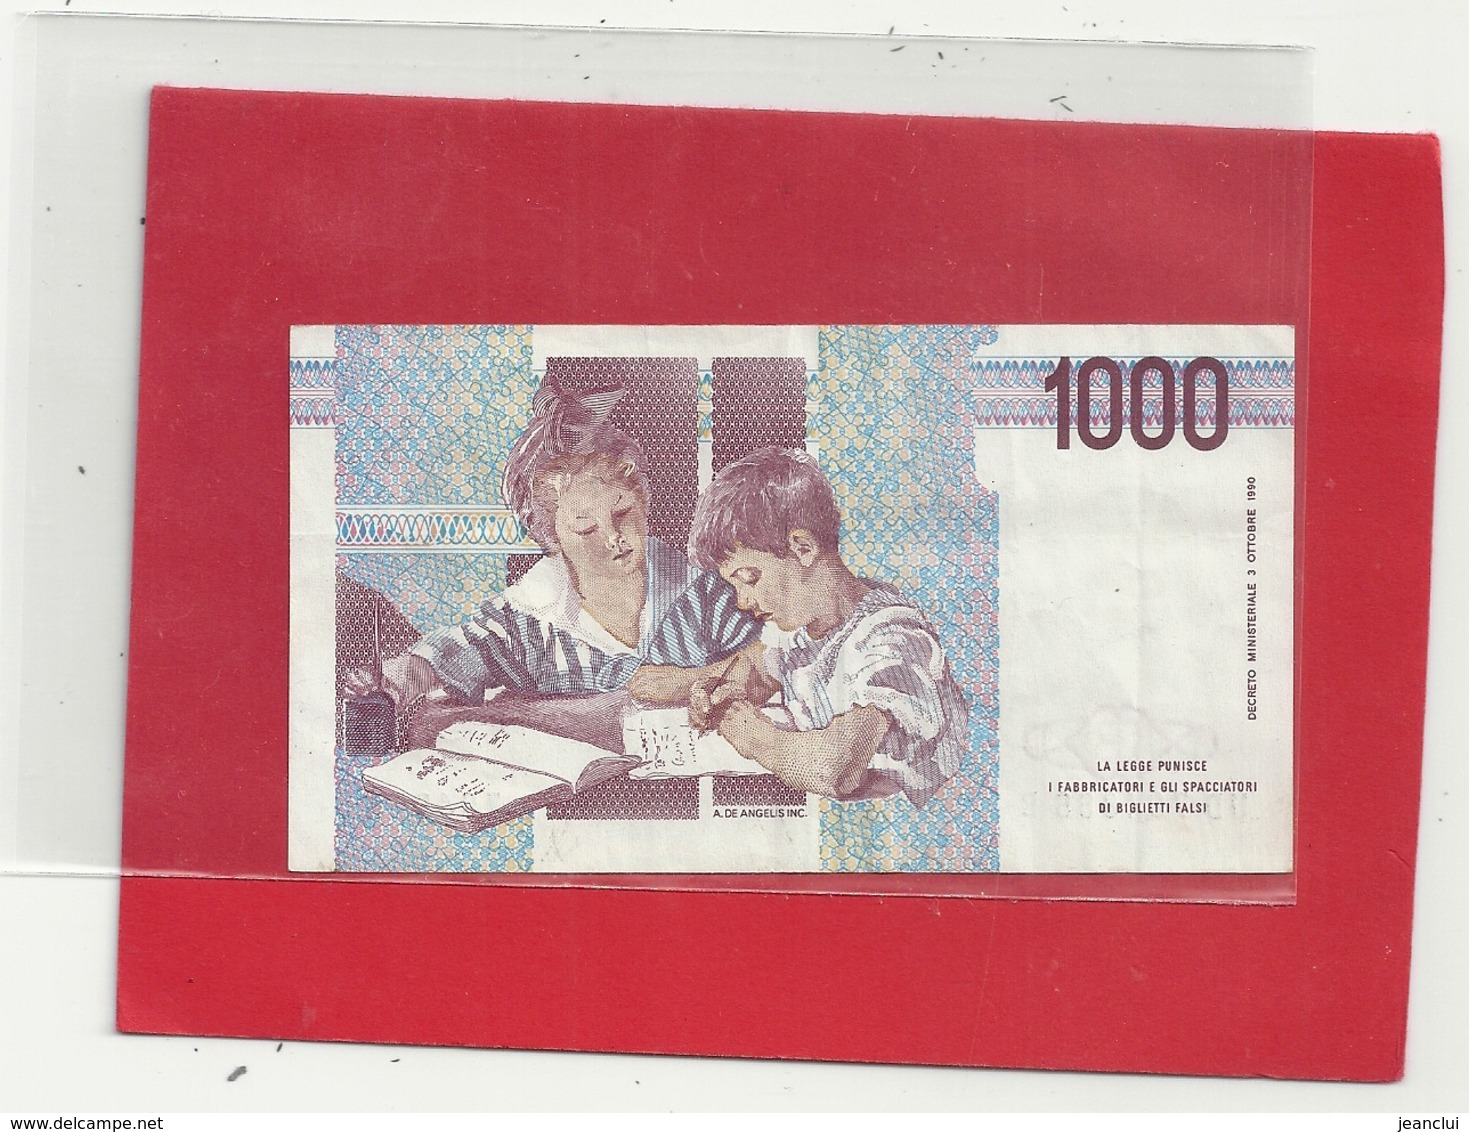 BANCA D'ITALIA . 1.000 LIRE . M. MONTESSORI . 3-10-1990 N° UD 704866 B   . 2 SCANES - 1000 Lire